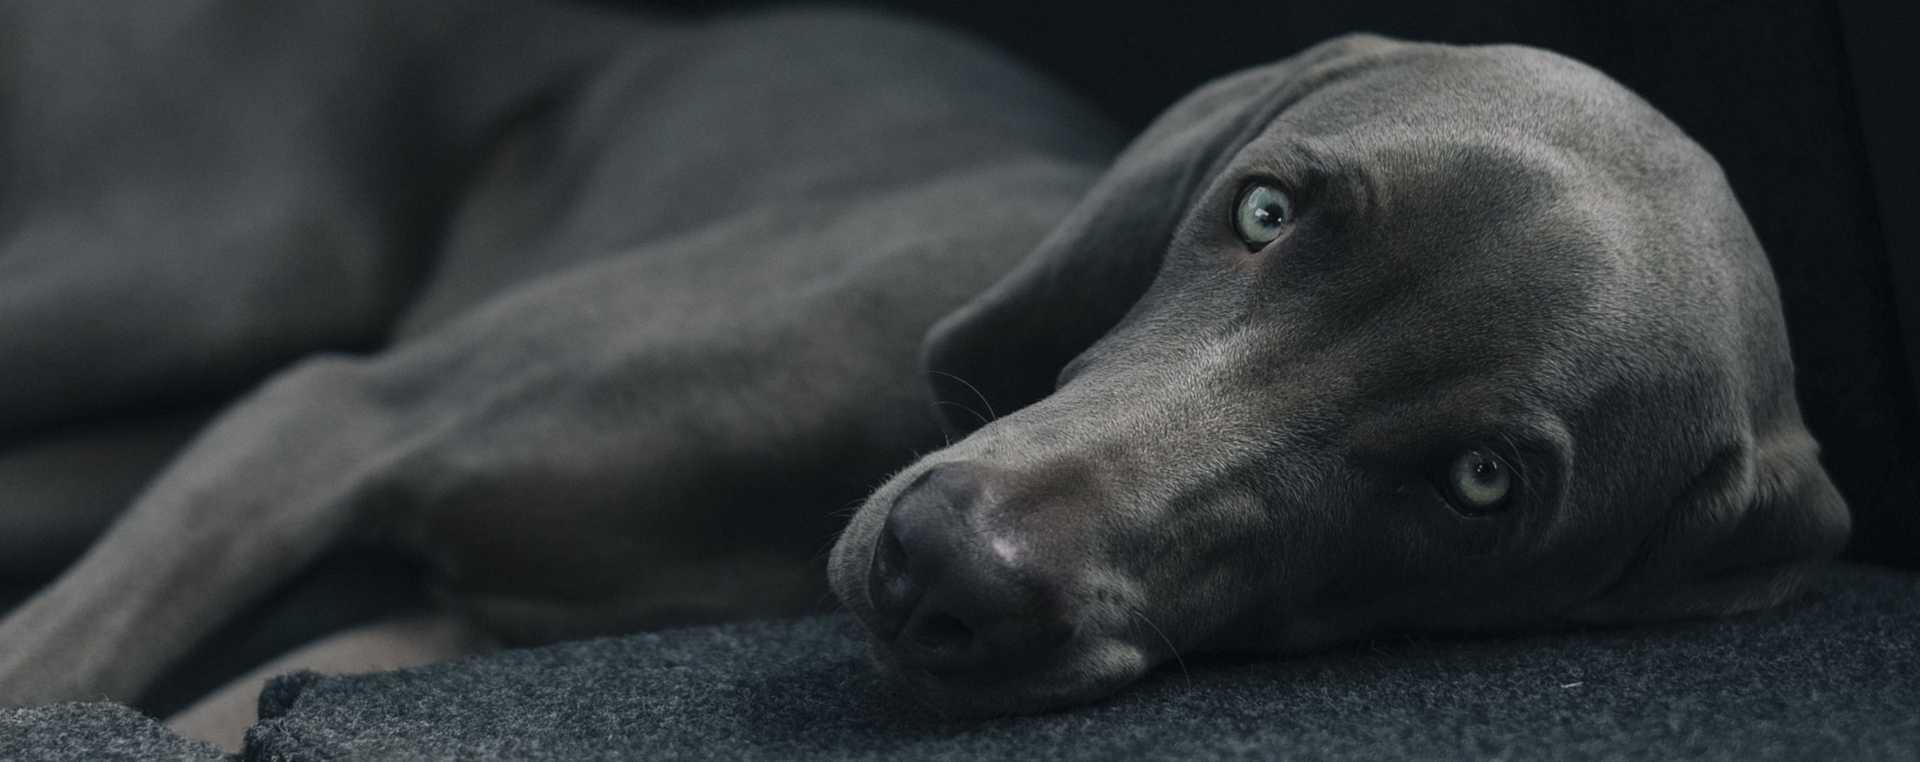 Hundebett Kunstleder Hintergrundbild